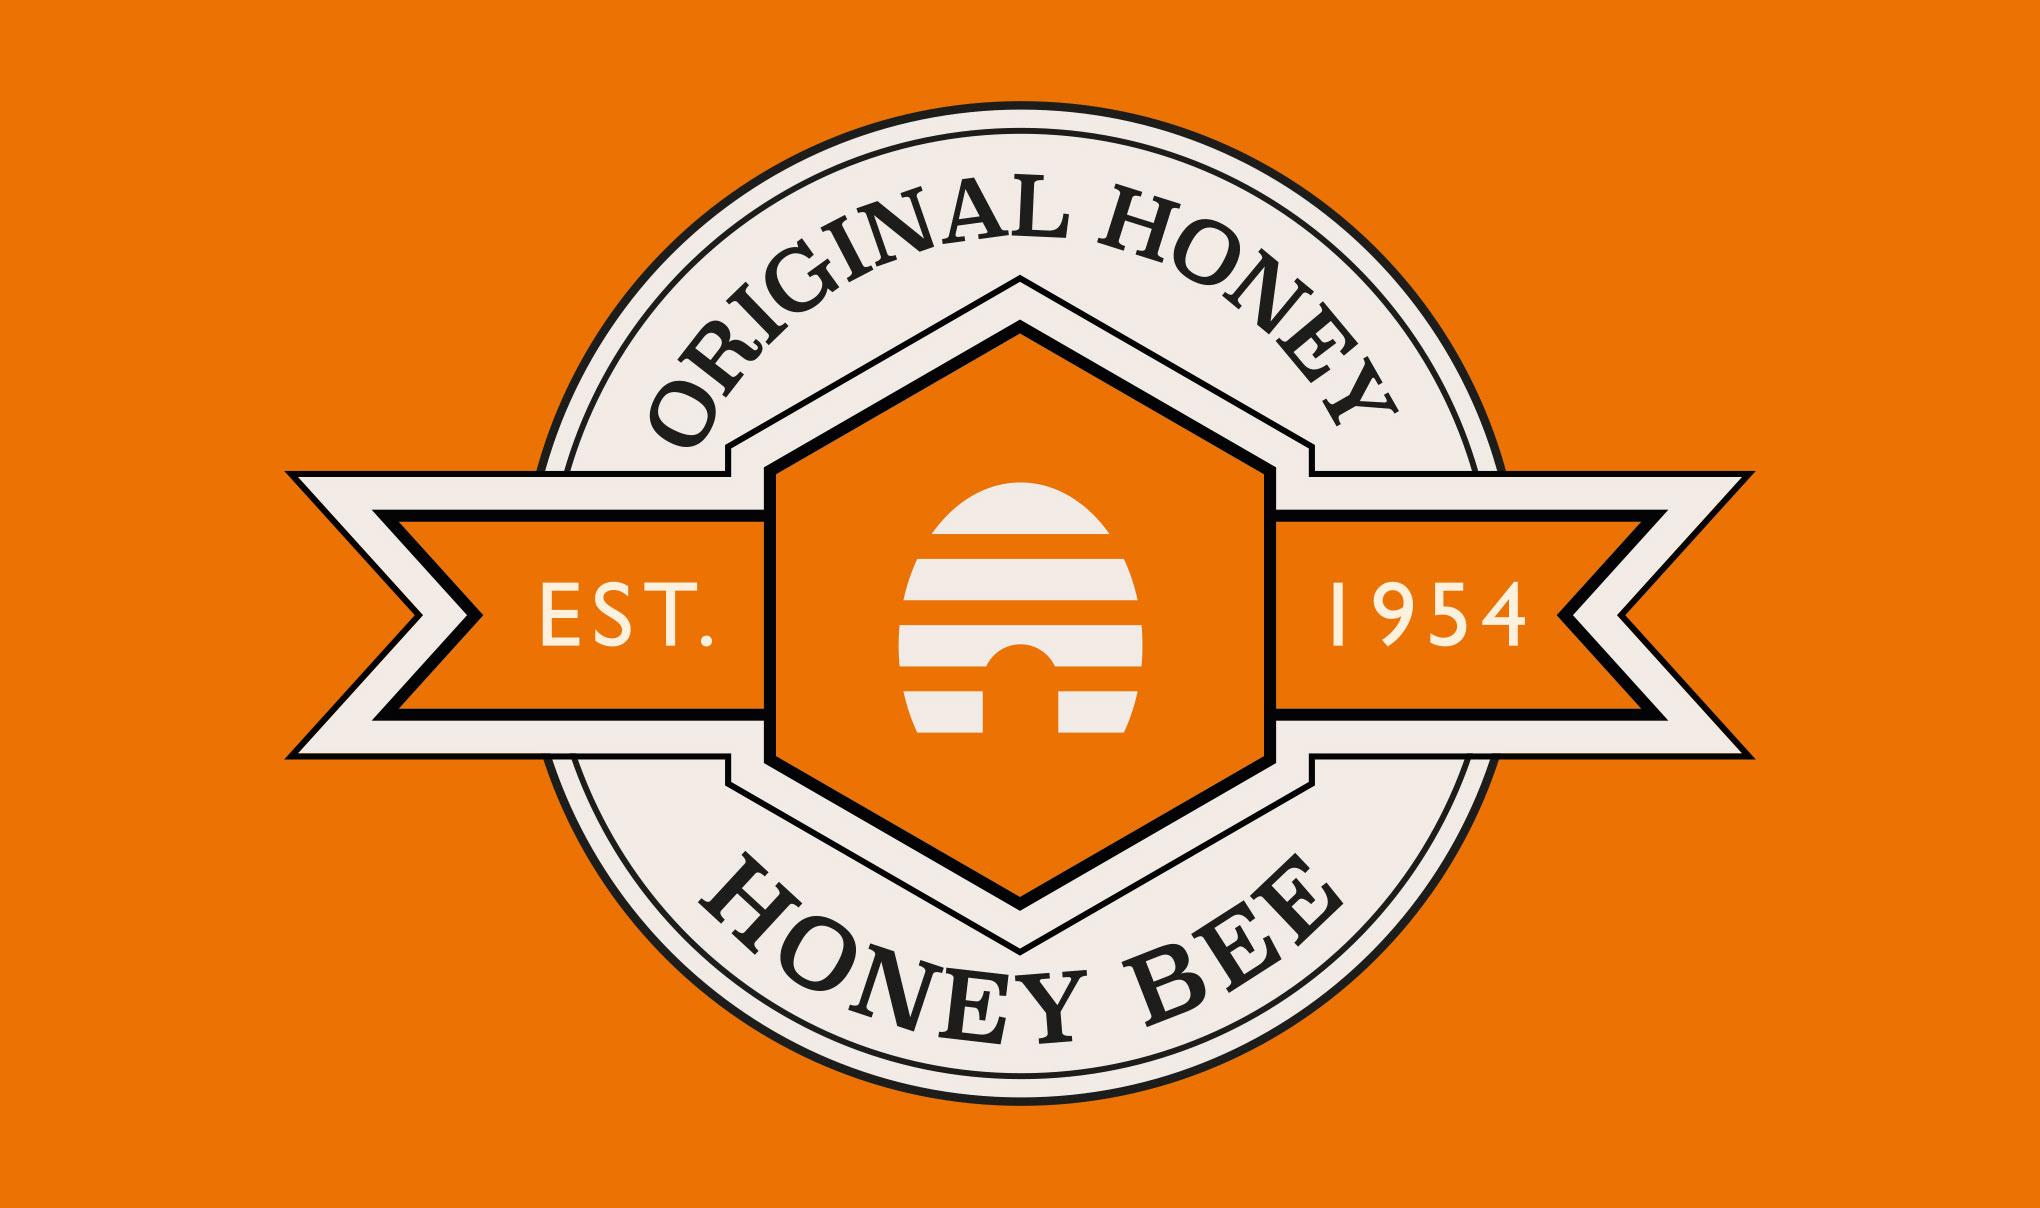 Brand logo for 'Honey Bee' on on orange background. Designed for Amber House by packaging design agency - Flipflop Design Ltd.